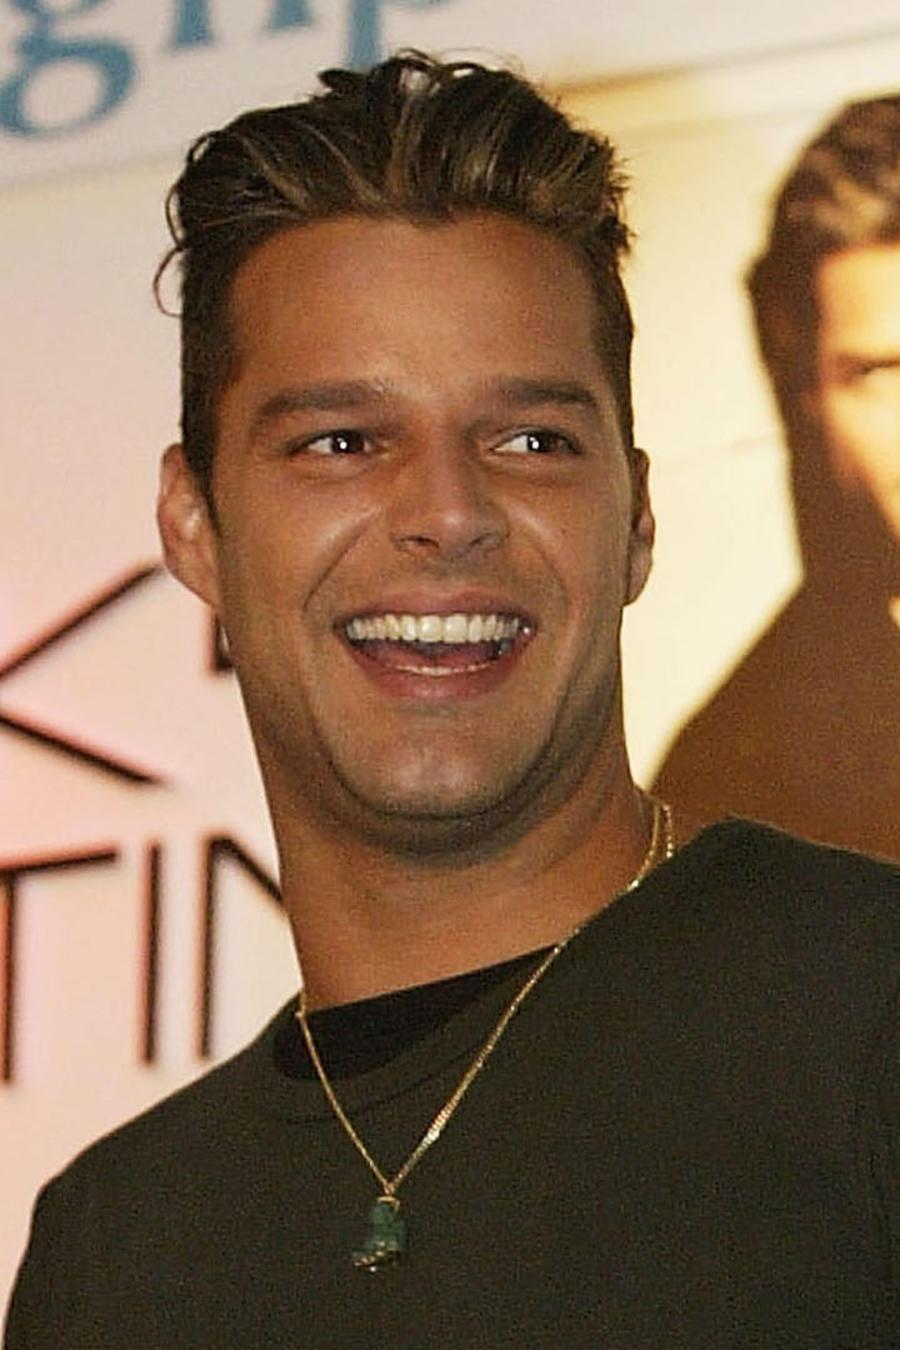 Ricky Martin sonriendo